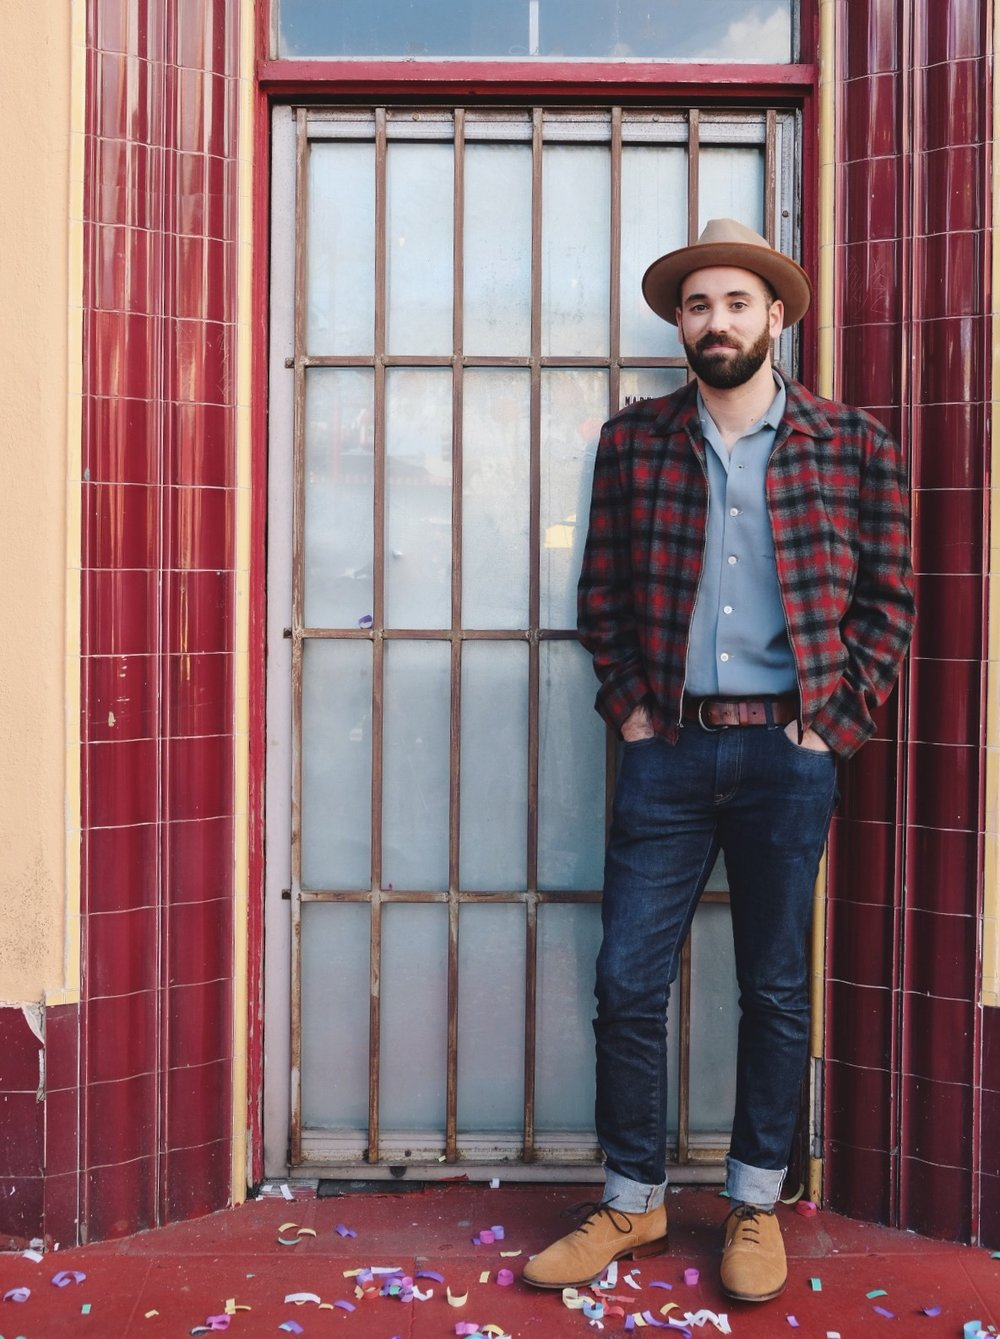 Nate standing in front of red tile doorway in Chinatown